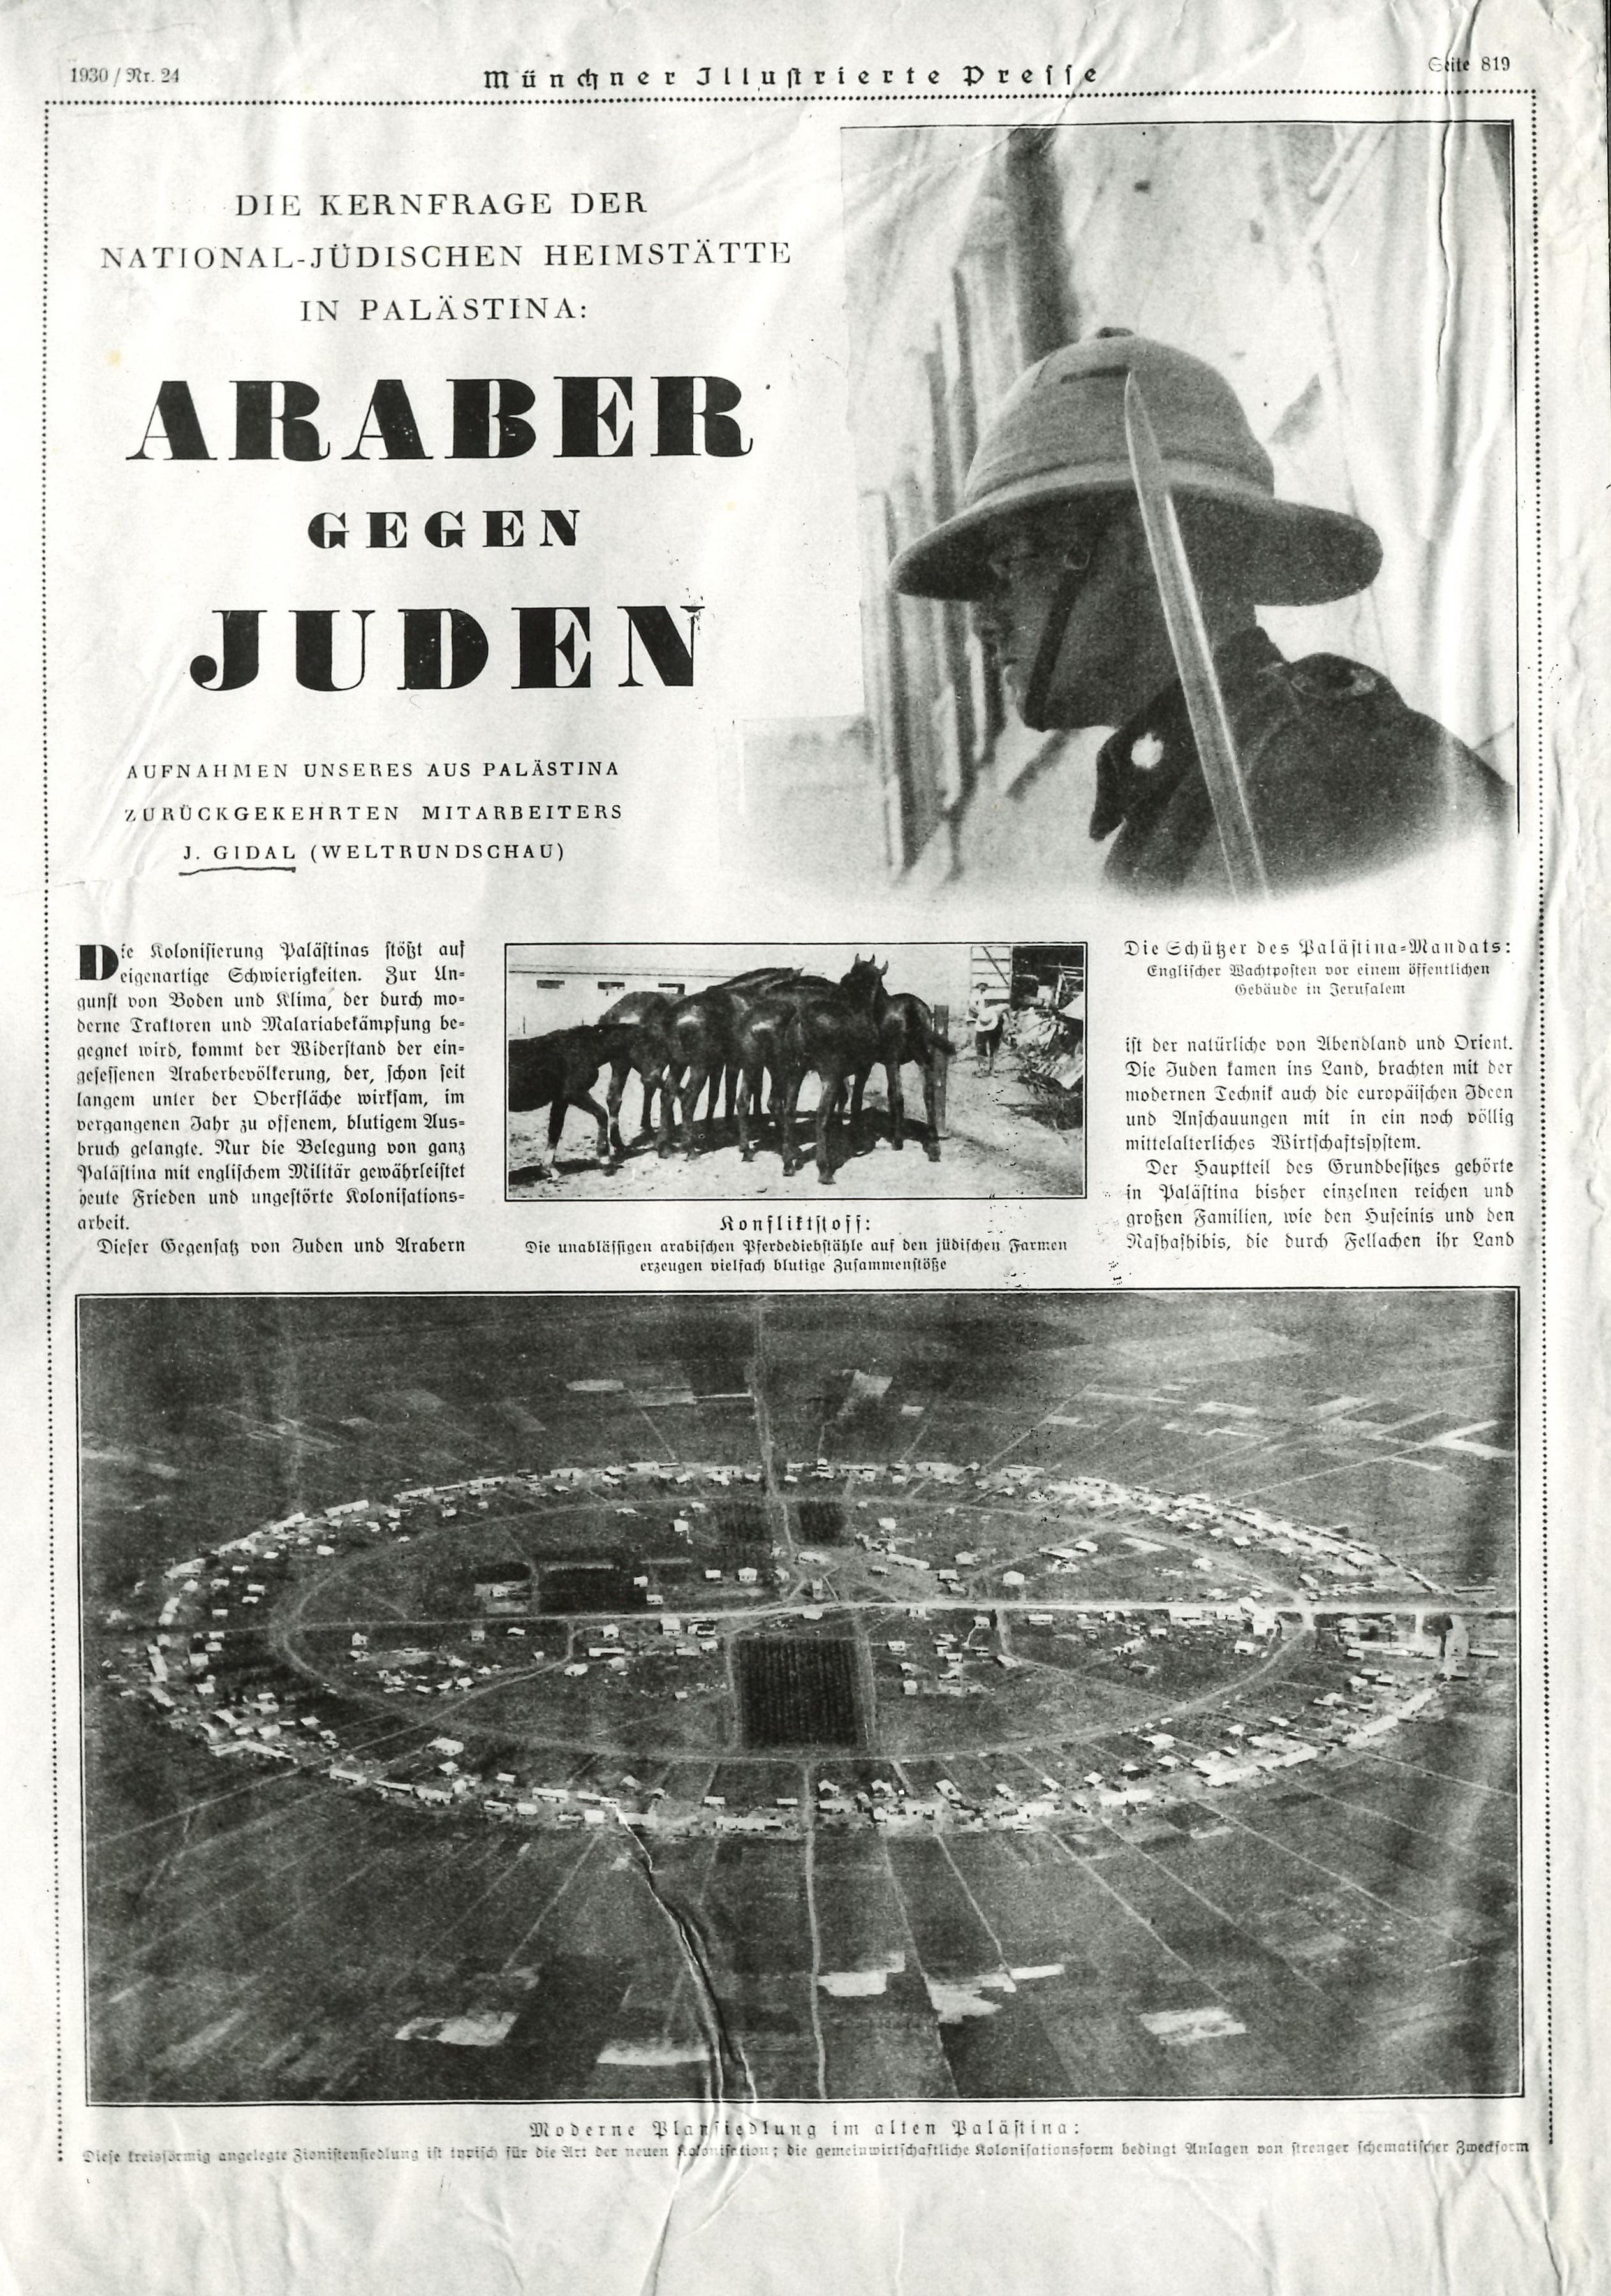 MIP, מונכנר אילוסטרירט פרס, ערבים נגד יהודים